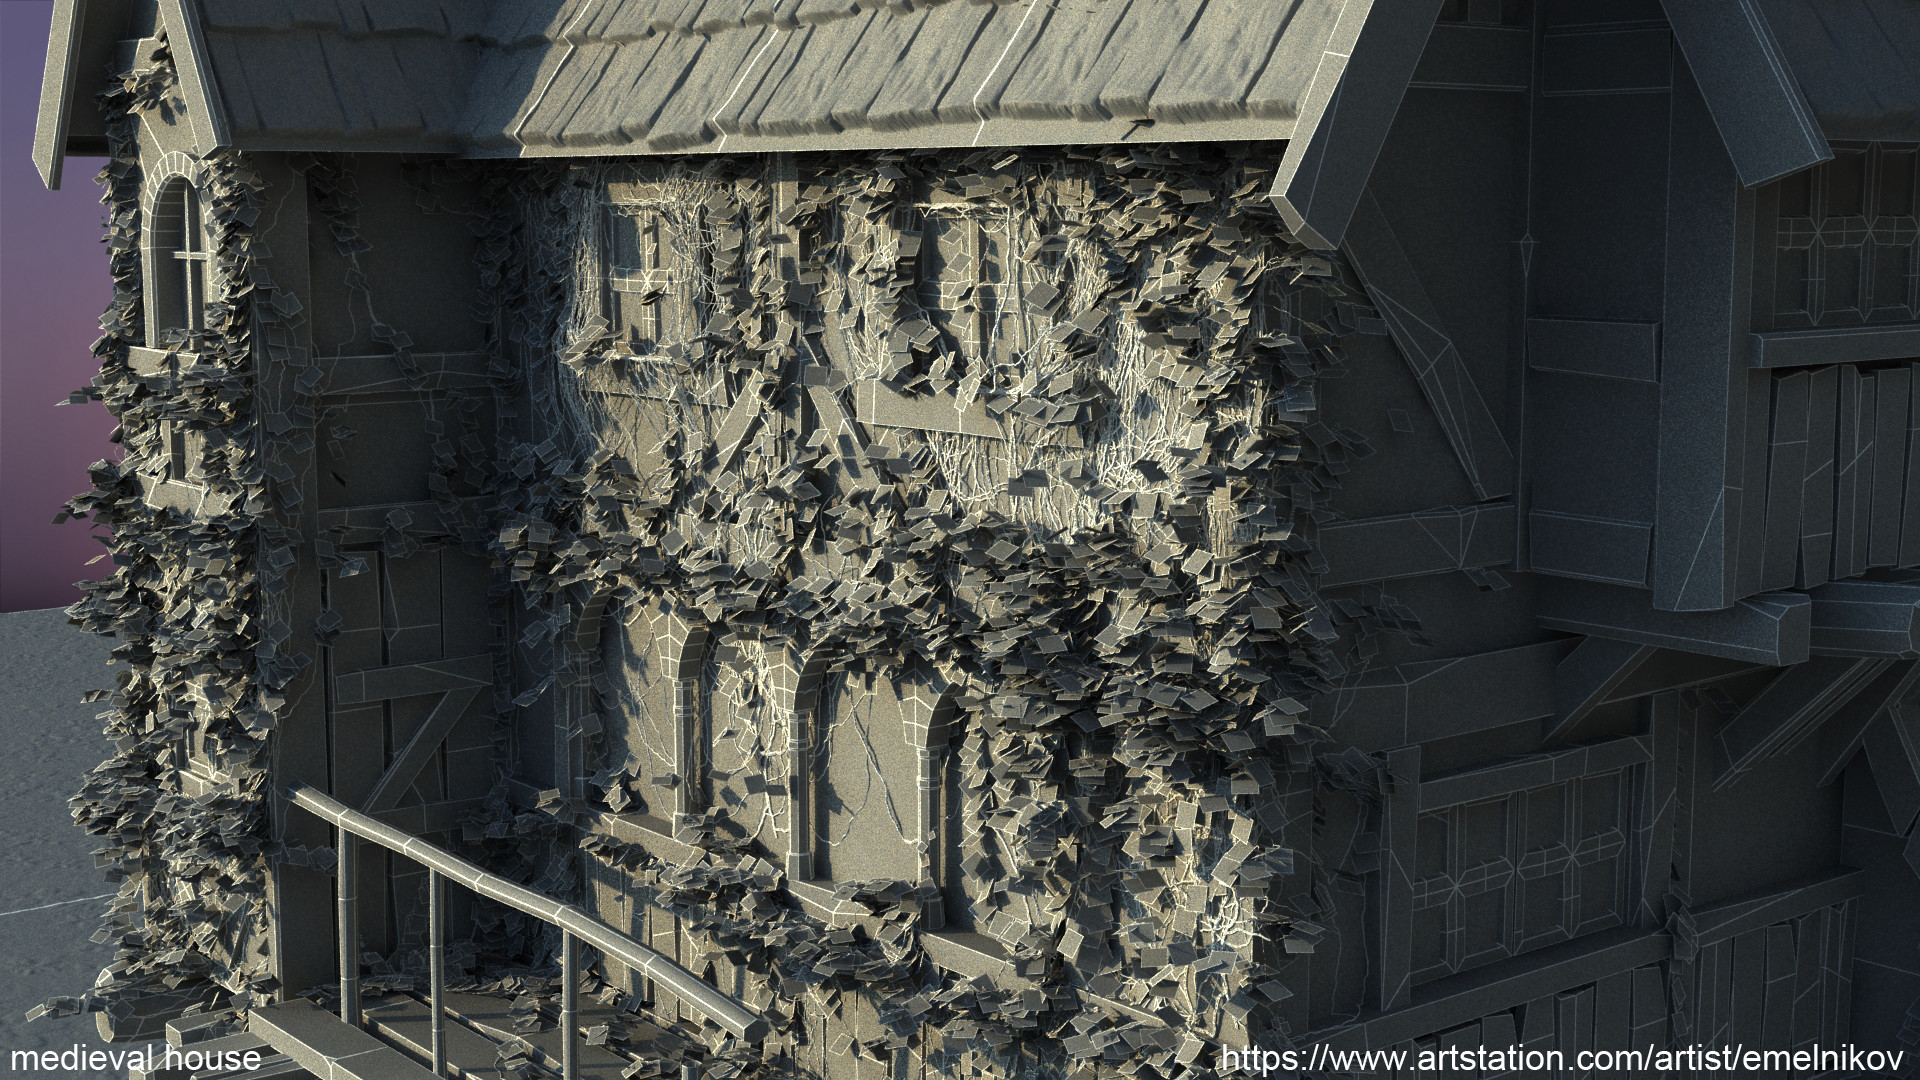 Eugene melnikov medieval house1 render frm1 wire